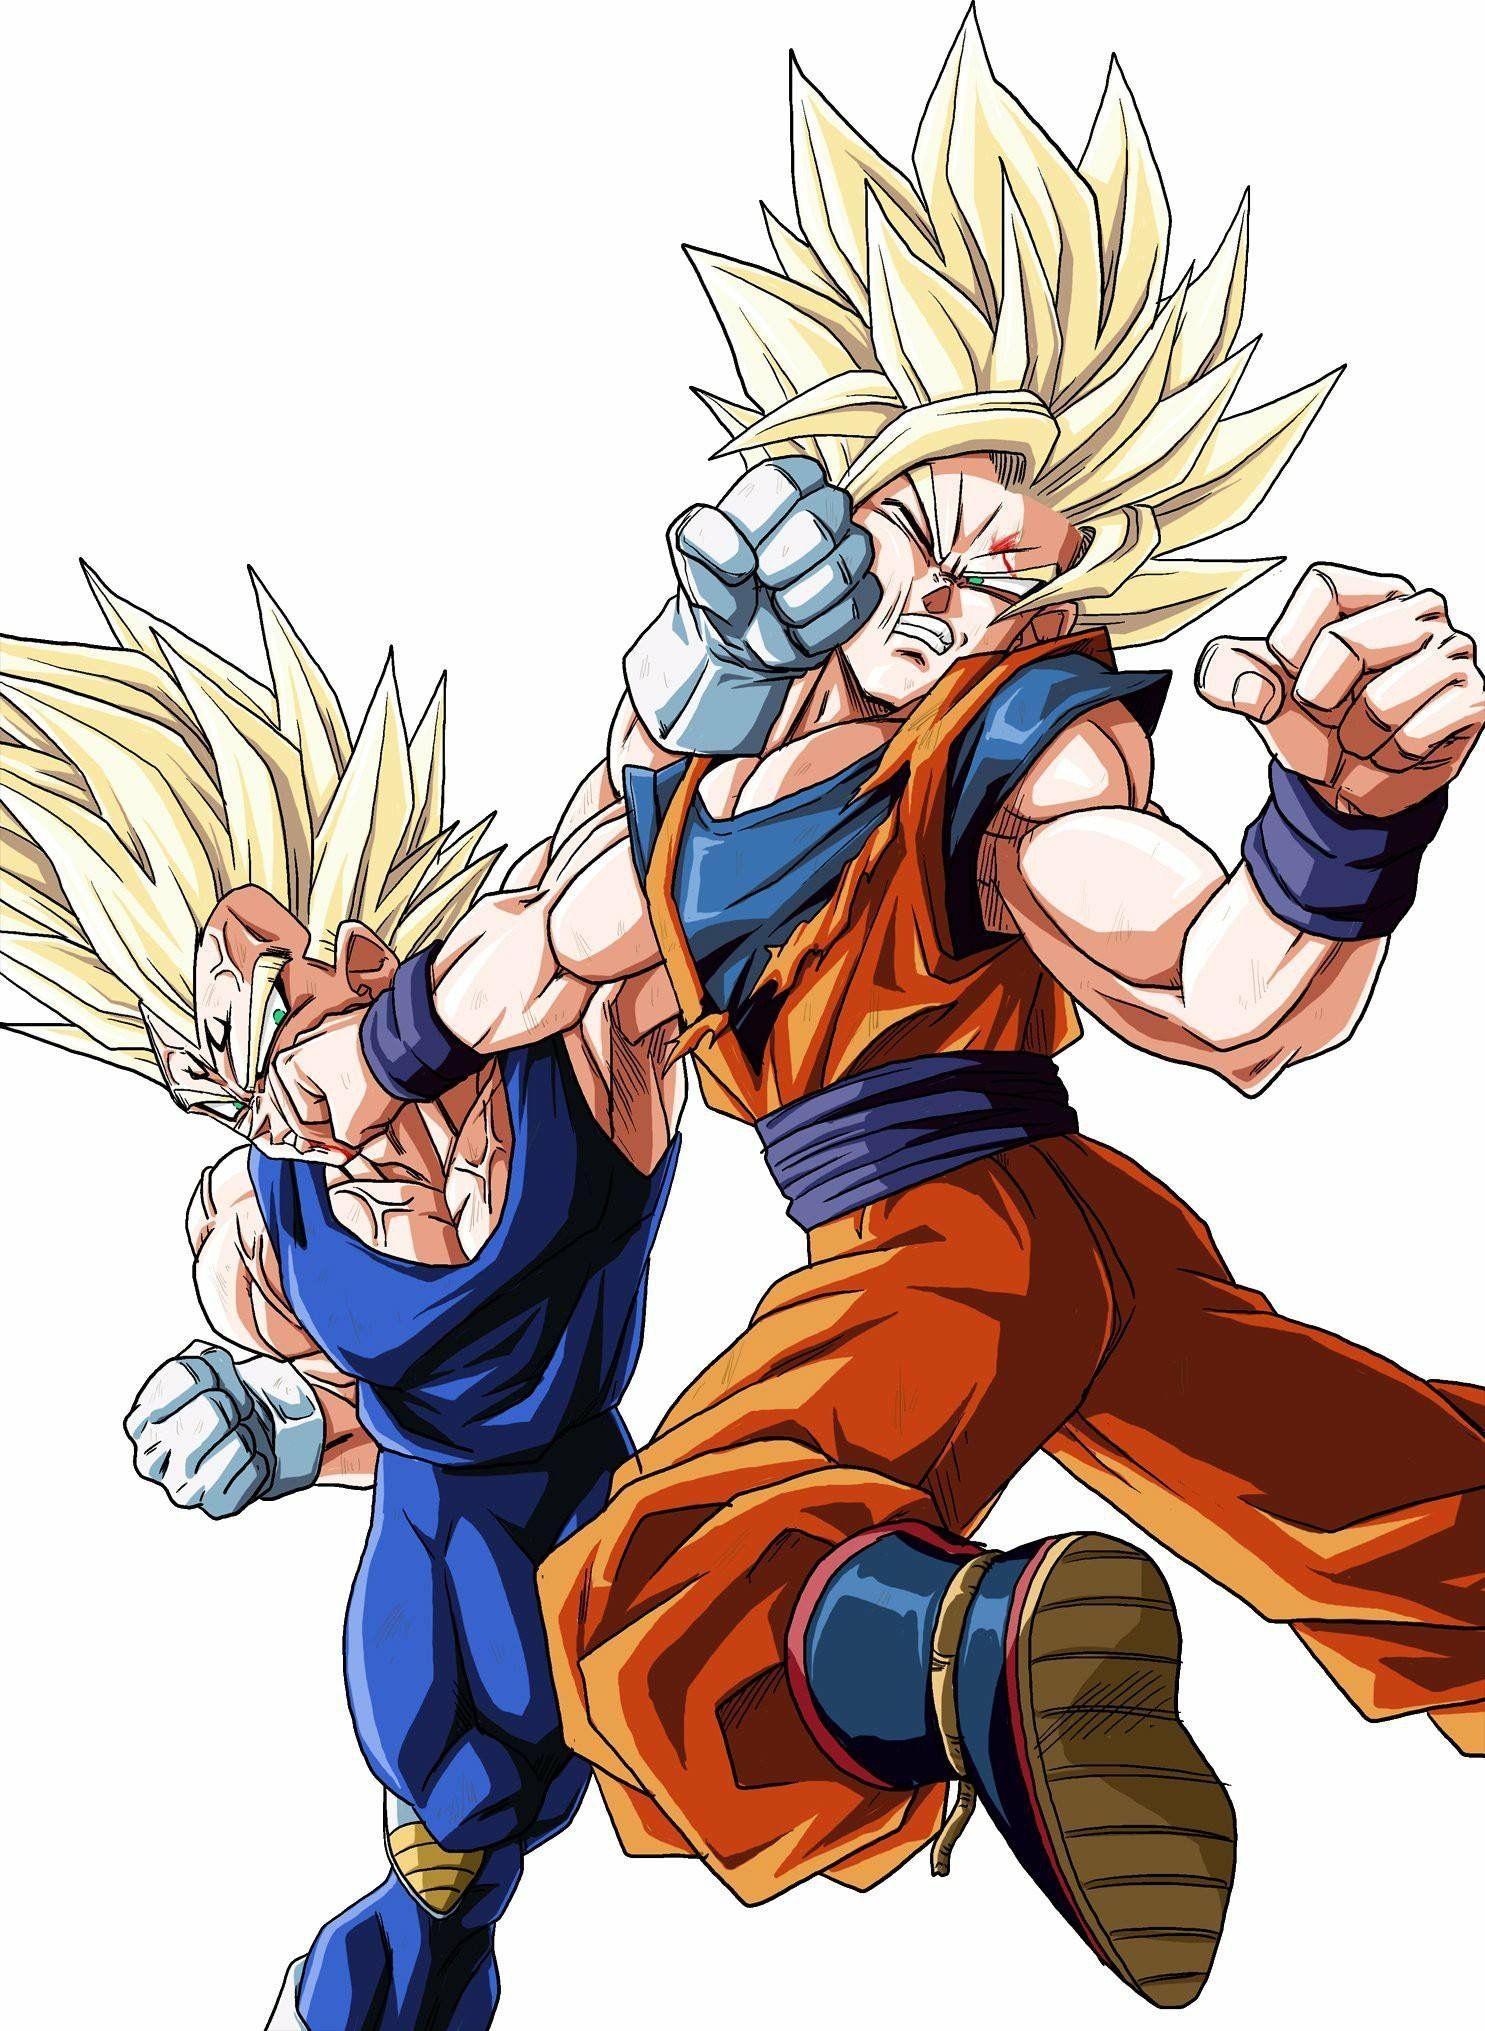 Pin De Goku Kamit En Dragonball Z Gt Kai Heroes Super Goku Y Vegeta Peleando Goku Y Vegeta Personajes De Goku